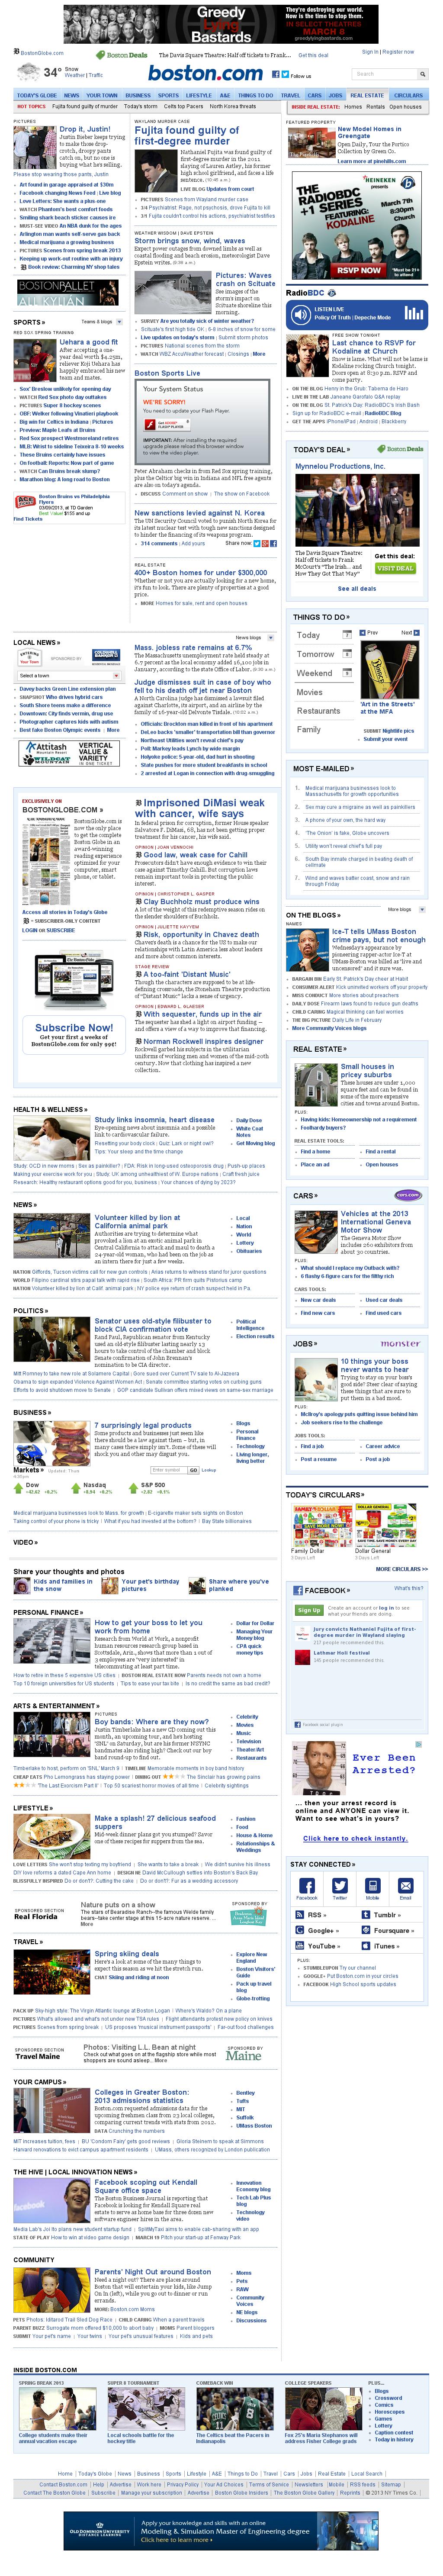 Boston.com at Thursday March 7, 2013, 5:01 p.m. UTC